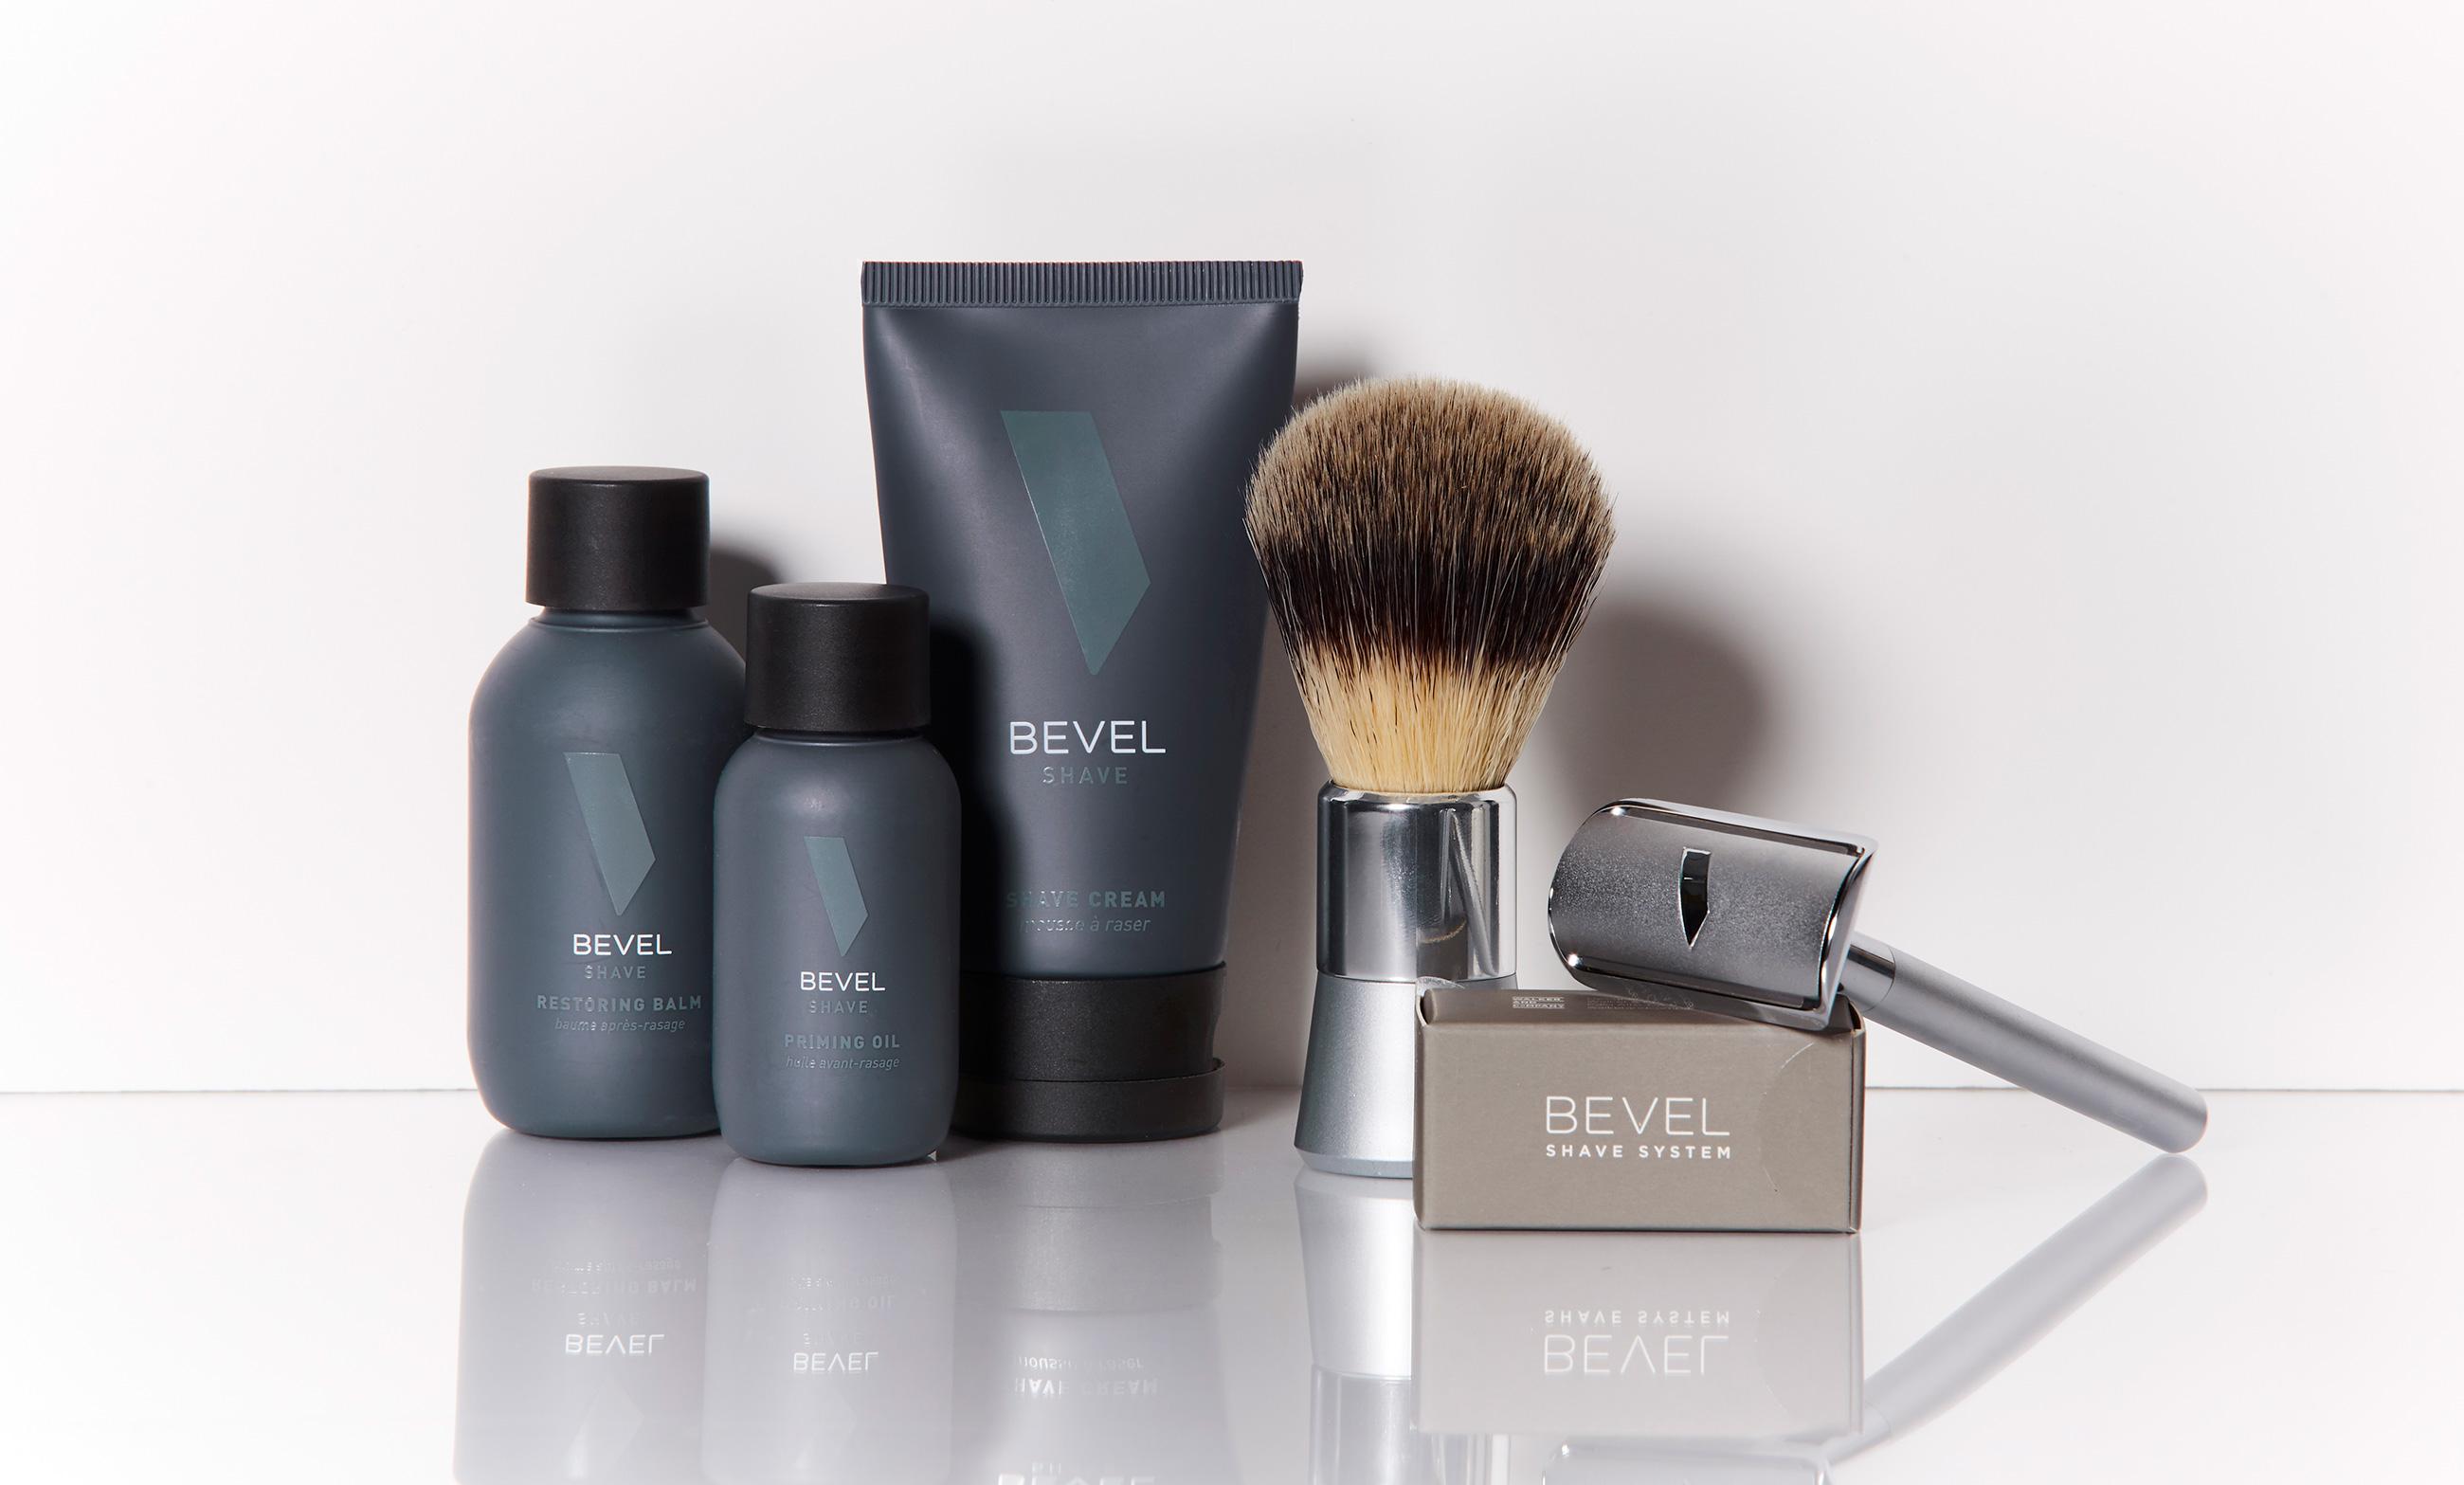 bevel shave razor bumps restoring balm priming oil cream